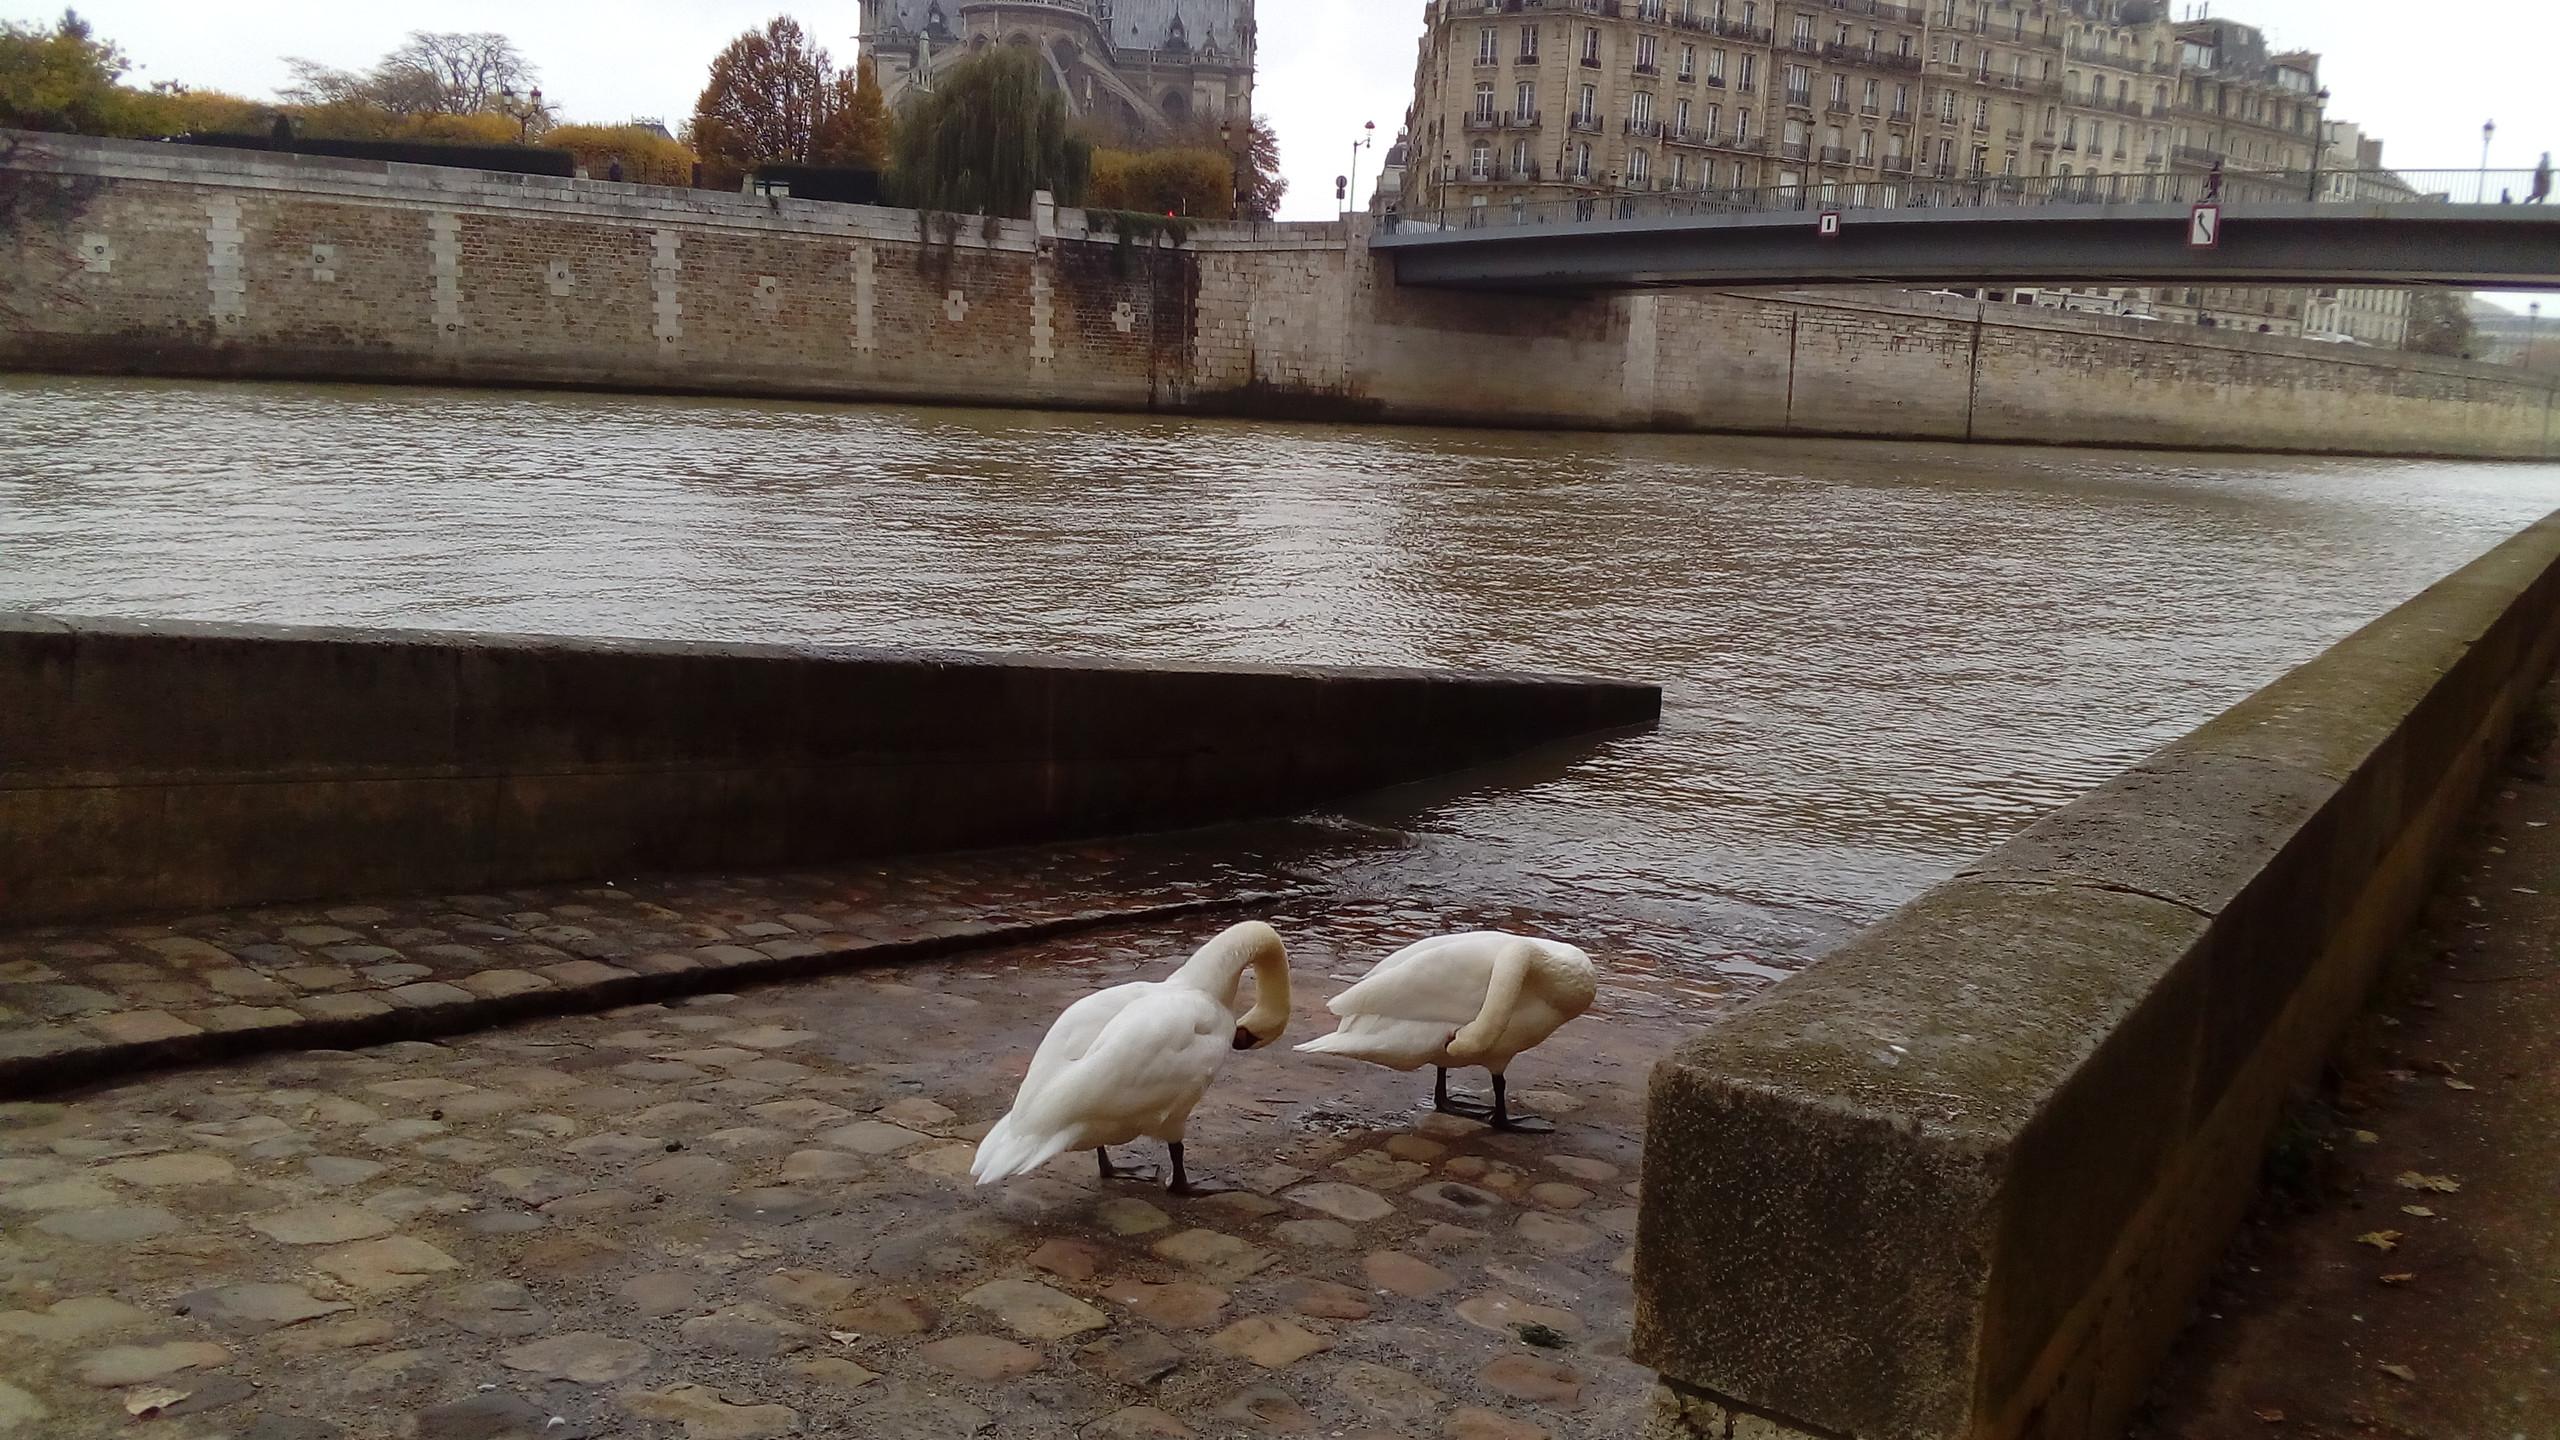 Swans on Ile St. Louis